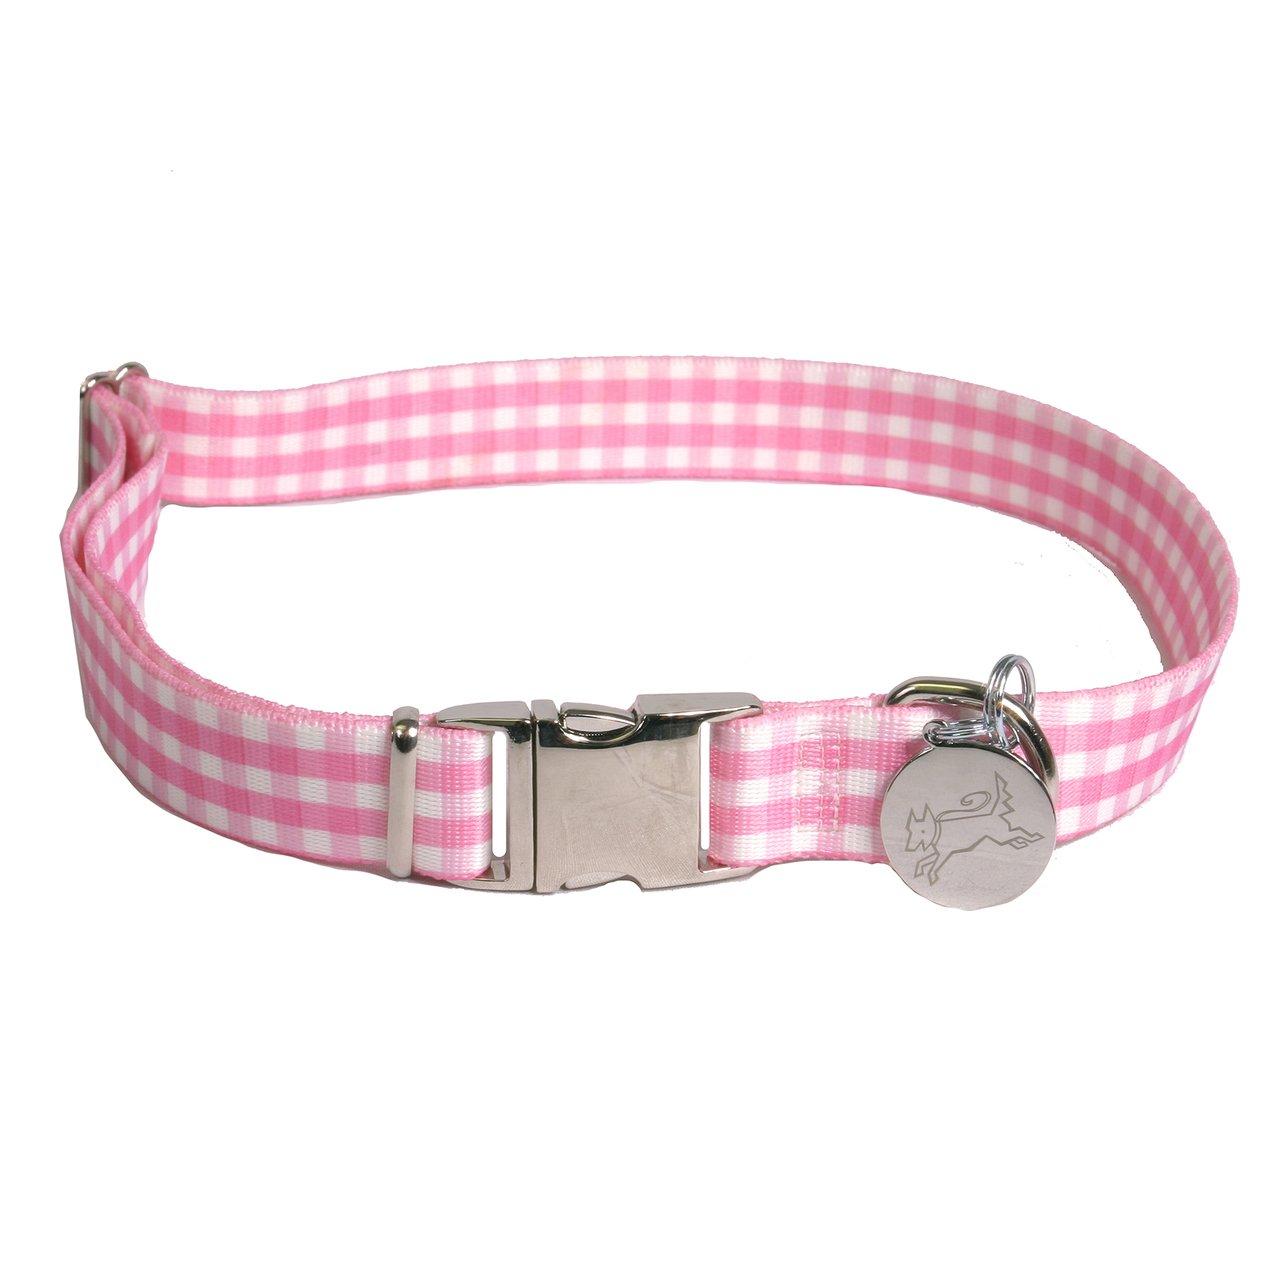 Southern Dawg Gingham Pink Premium Dog Collar - Size Medium 14'' - 20'' by Yellow Dog Design